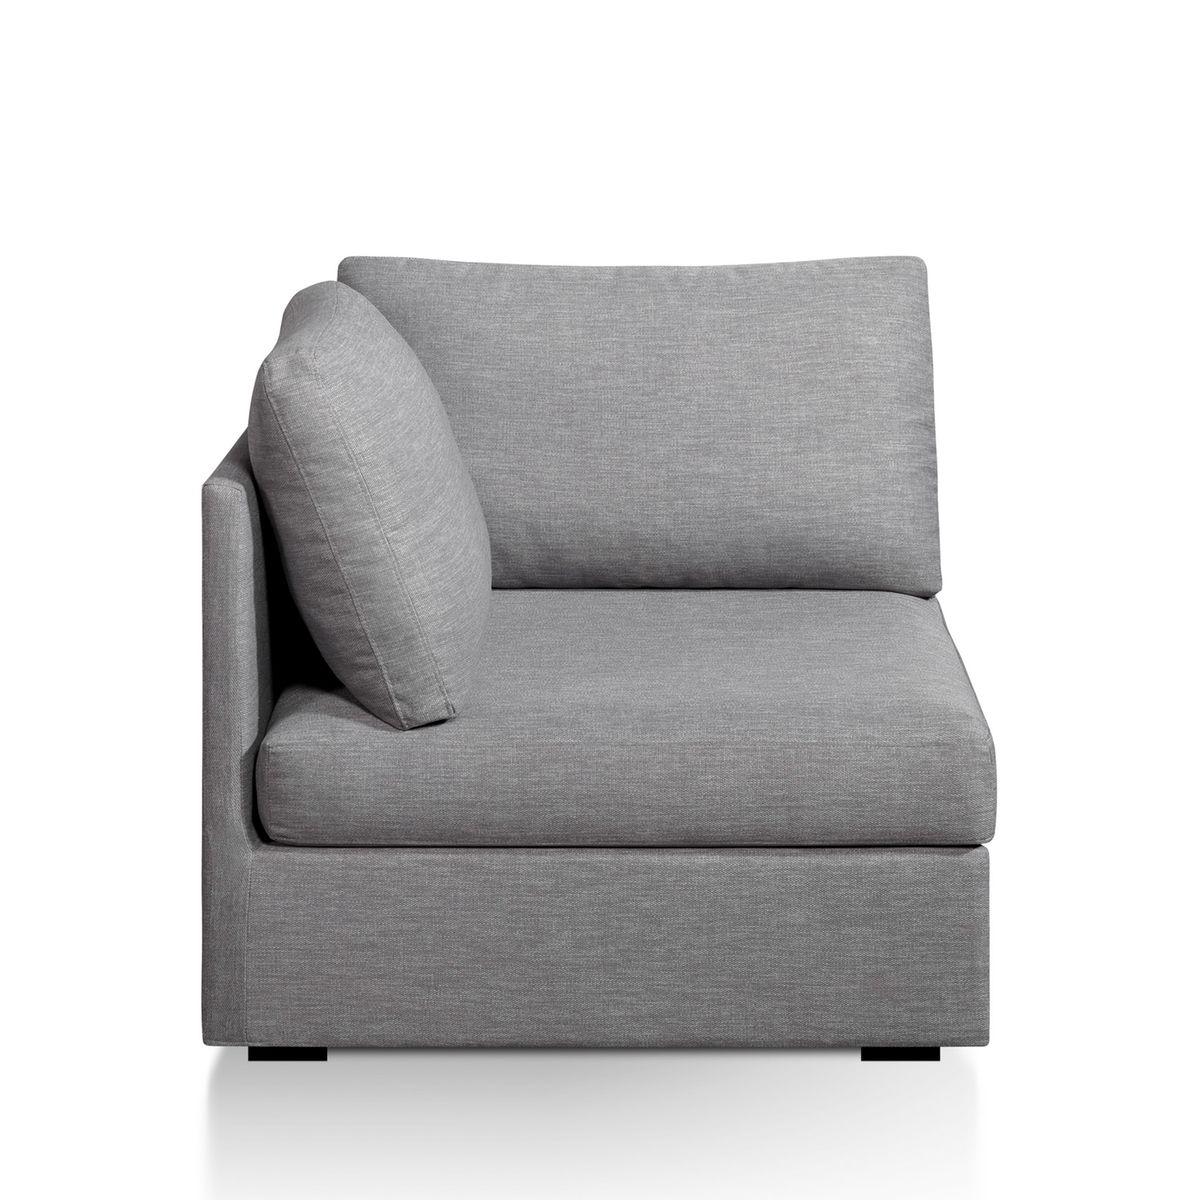 achat canap s salle salon meubles discount page 10. Black Bedroom Furniture Sets. Home Design Ideas